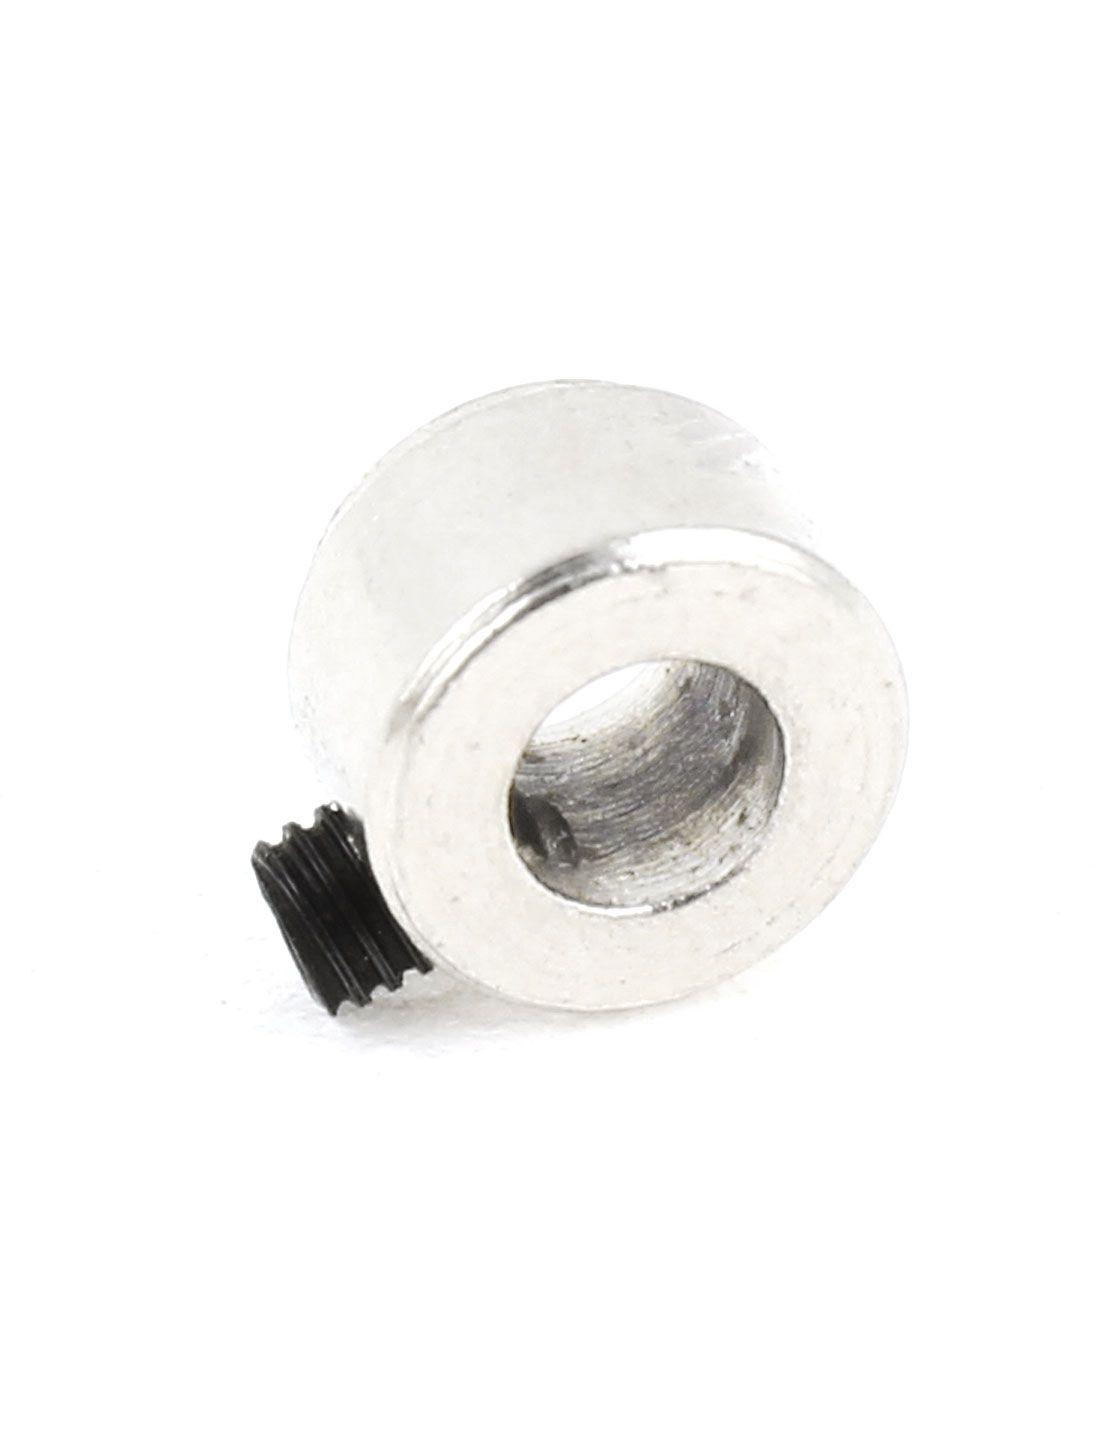 78829 - Colar para Trem de Pouso Wheel Stop Set Collar 3mm